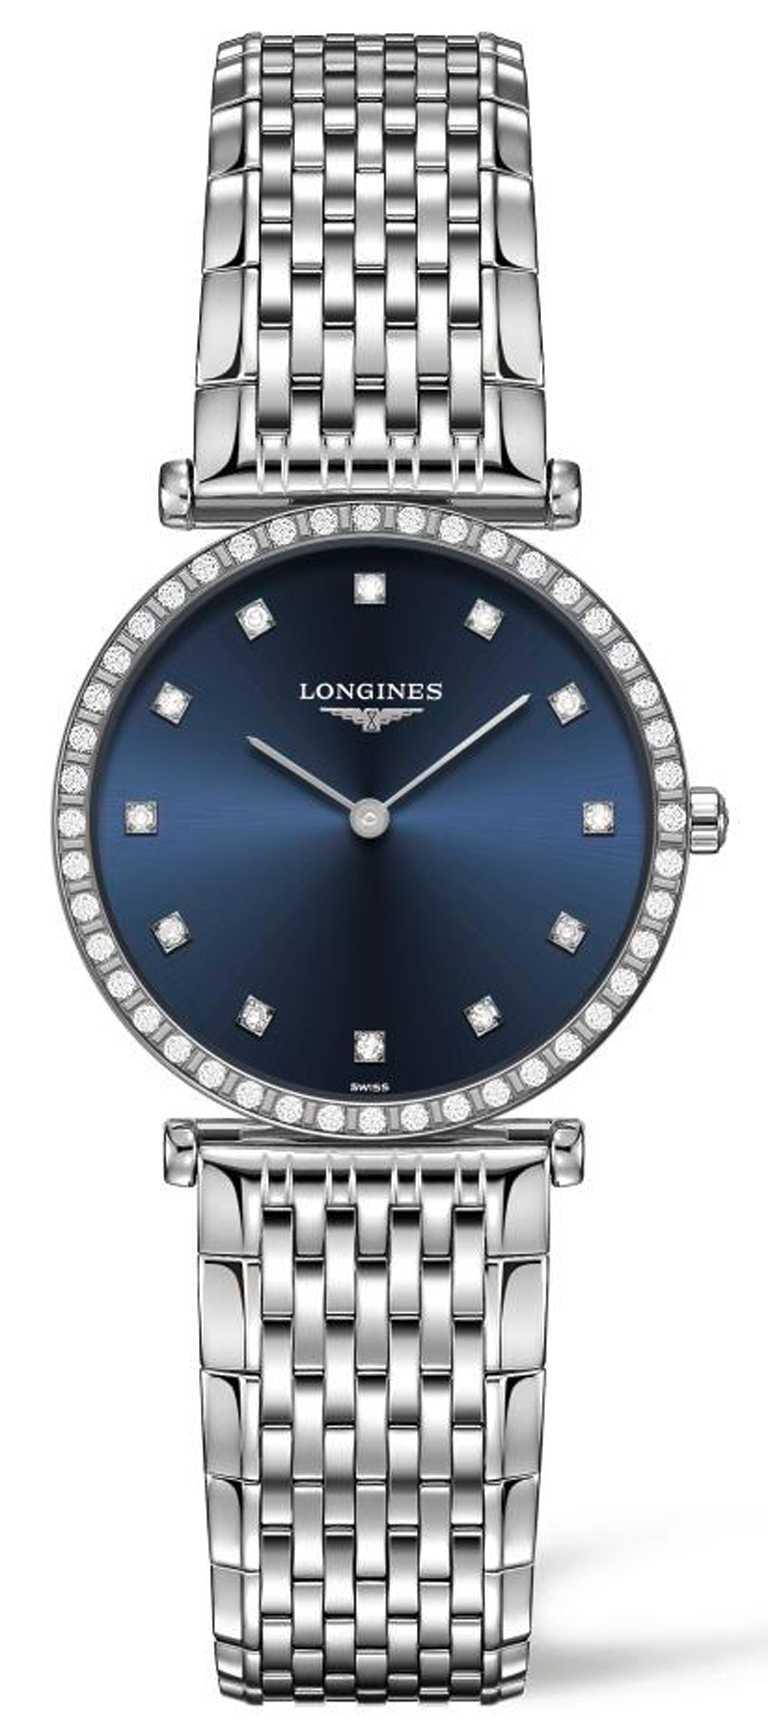 LONGINES「La Grande Classique嘉嵐系列」藍面鑽圈腕錶」,不鏽鋼錶殼,43mm,鑽石44顆╱111,000元。(圖╱LONGINES提供)